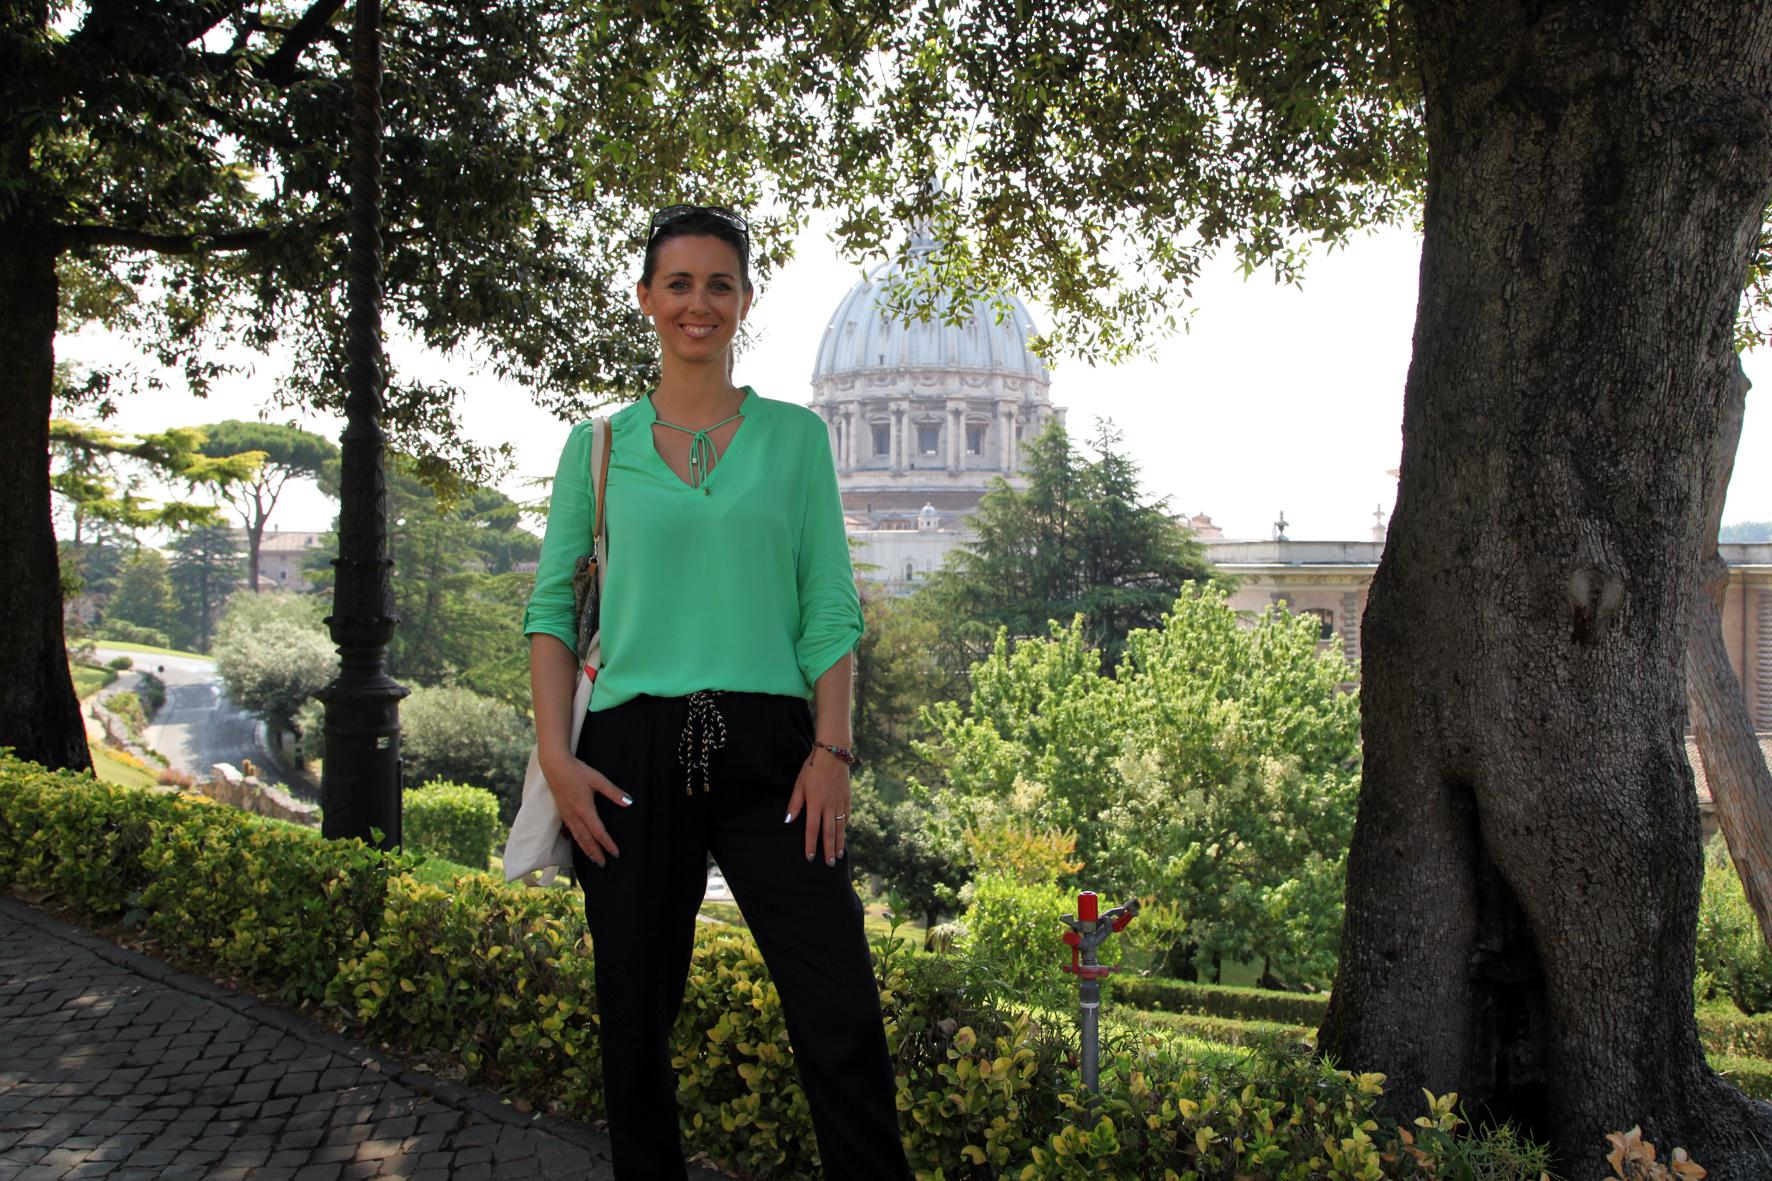 Vatican Gardens, Italy